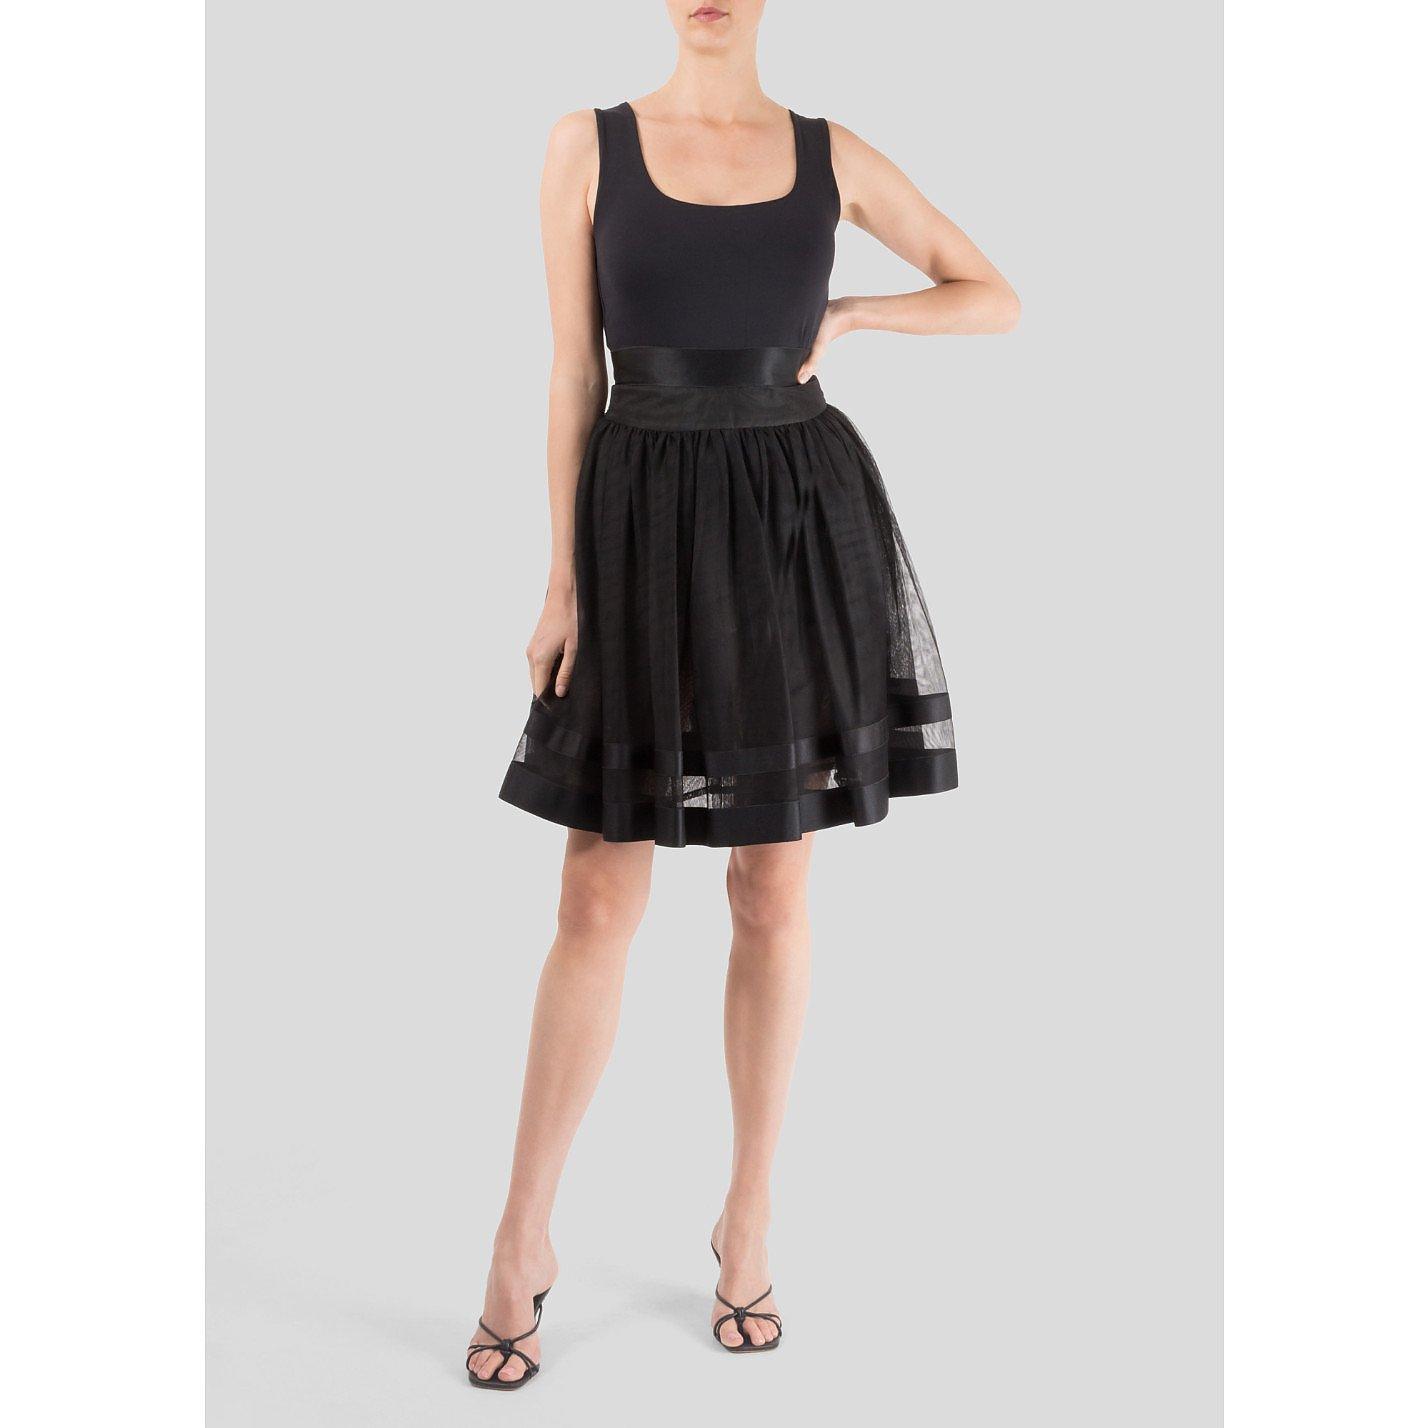 CHANEL Tulle High Waisted Skirt